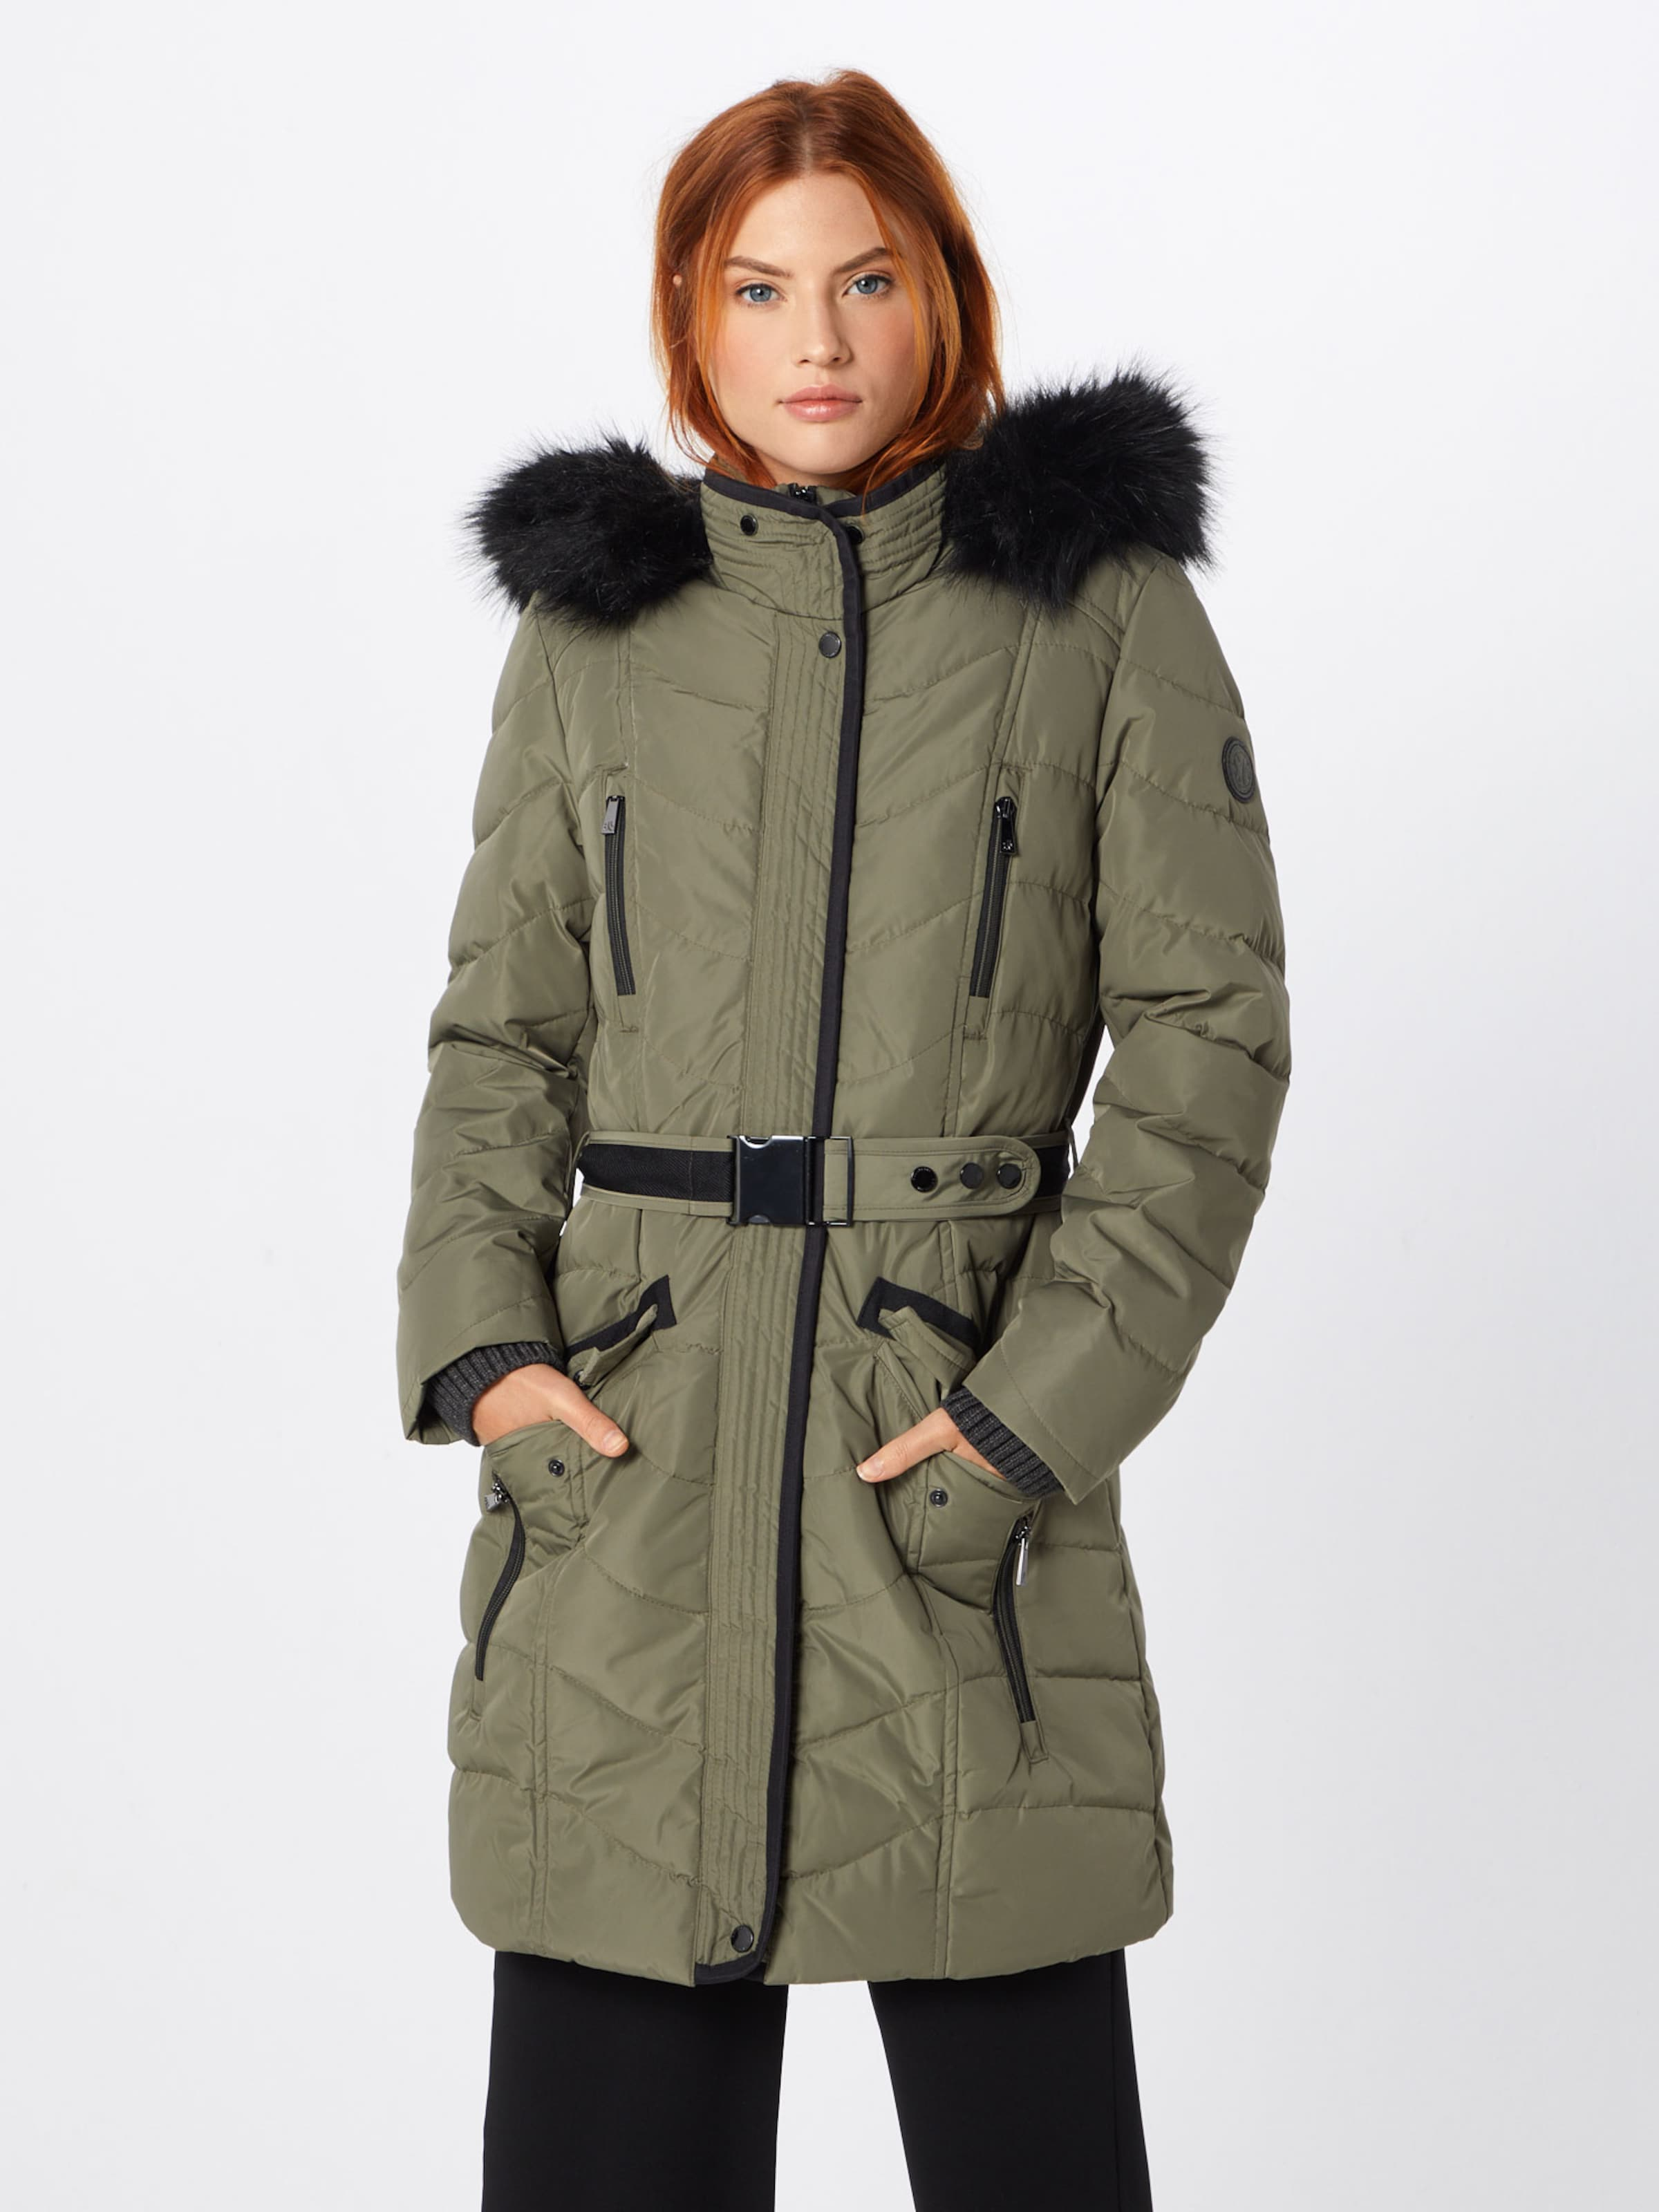 Red oliver En D'hiver Label S Manteau Kaki jA54R3L